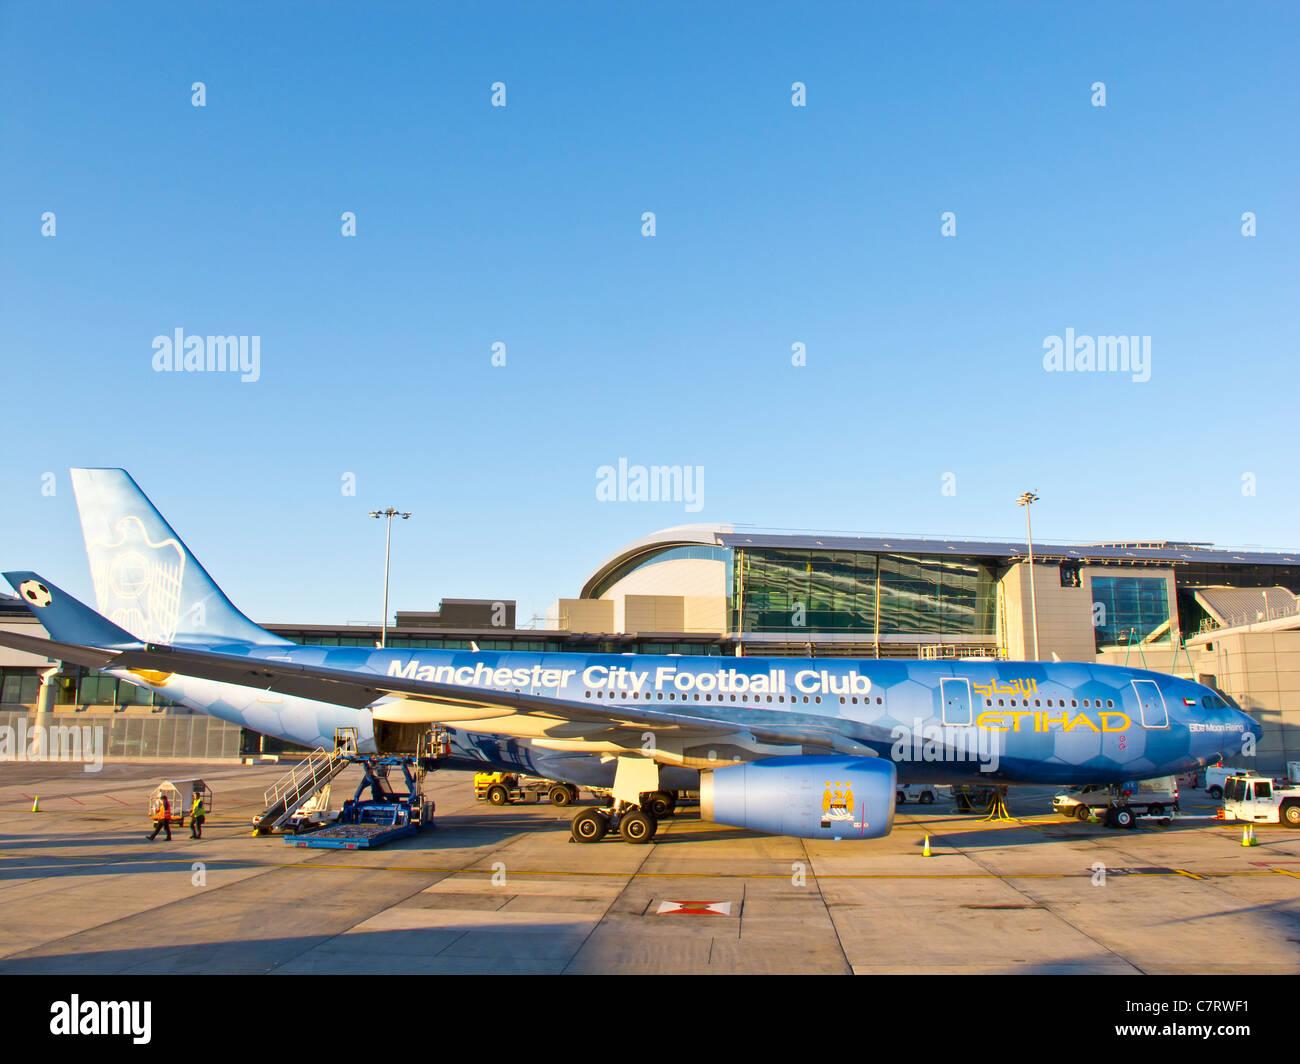 Airbus 330 plane - Stock Image